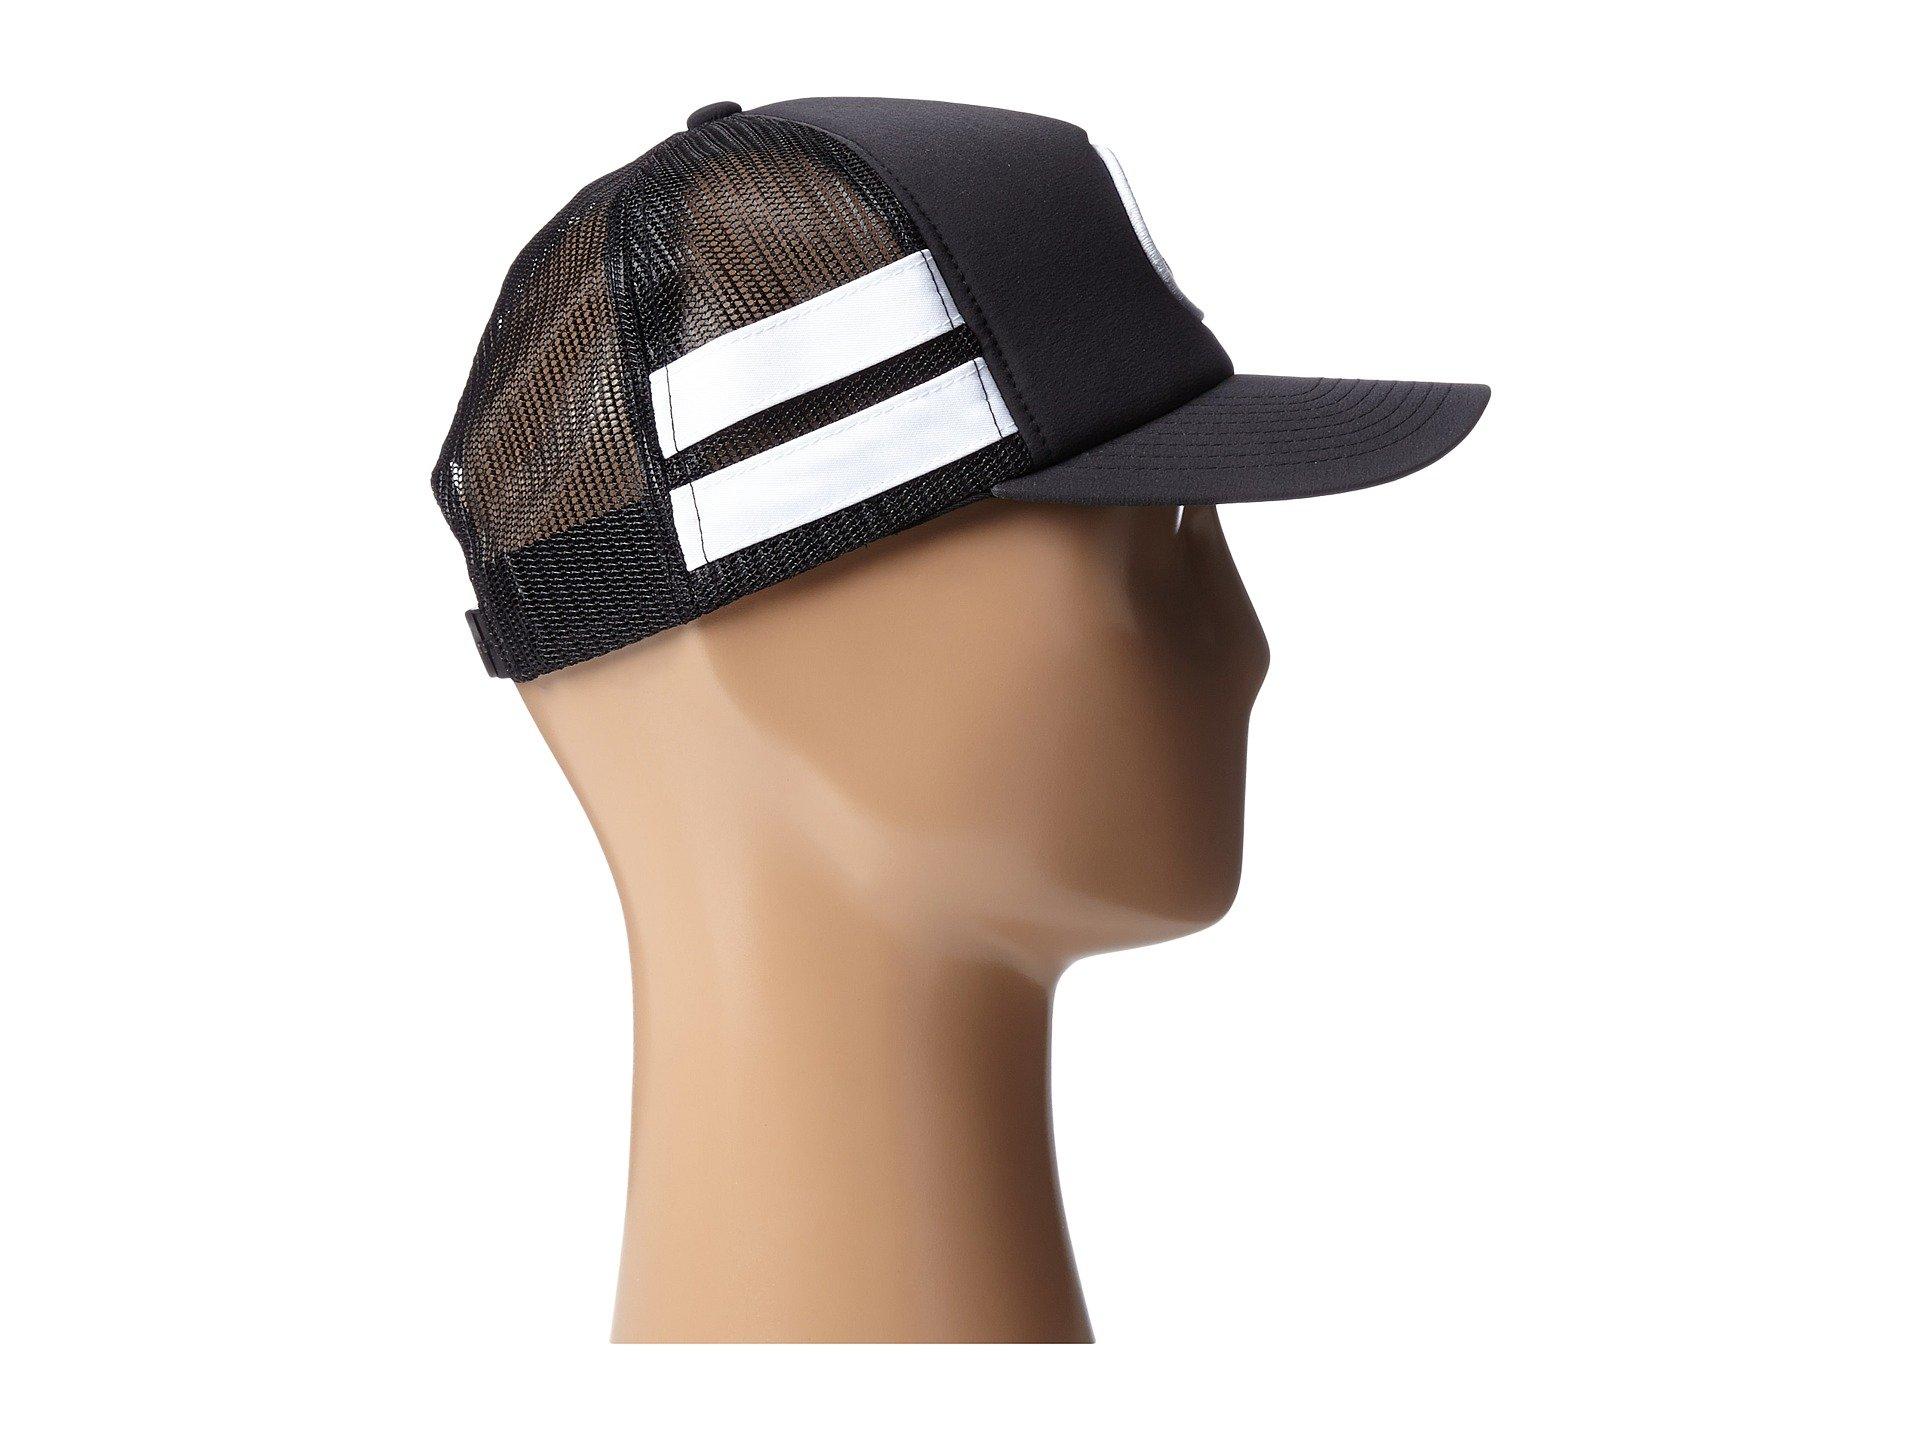 Lyst - Hurley Phantom Block Party Trucker Hat in Black ccf7061c0e74